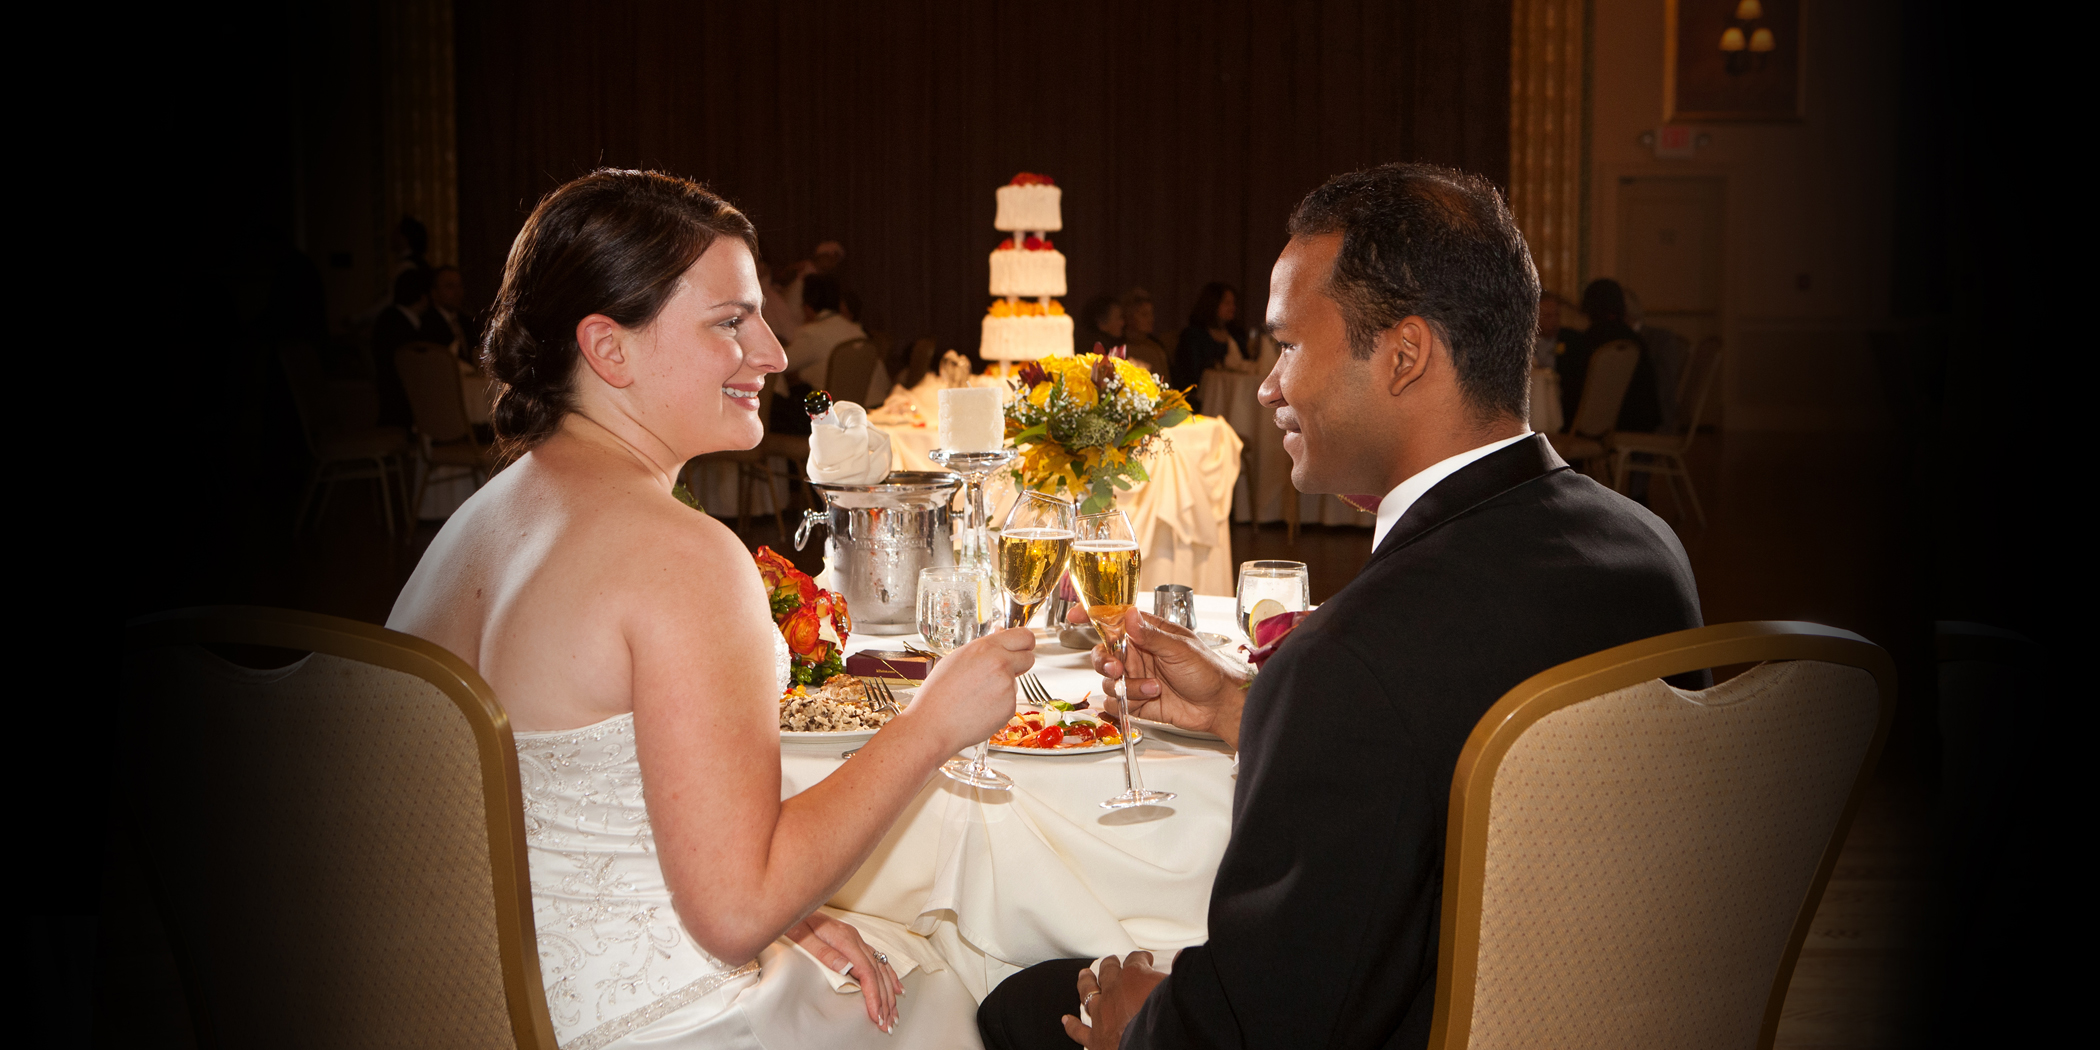 Wedding-Photography-Palaise-Royale-South-Bend-Indiana_24.jpg